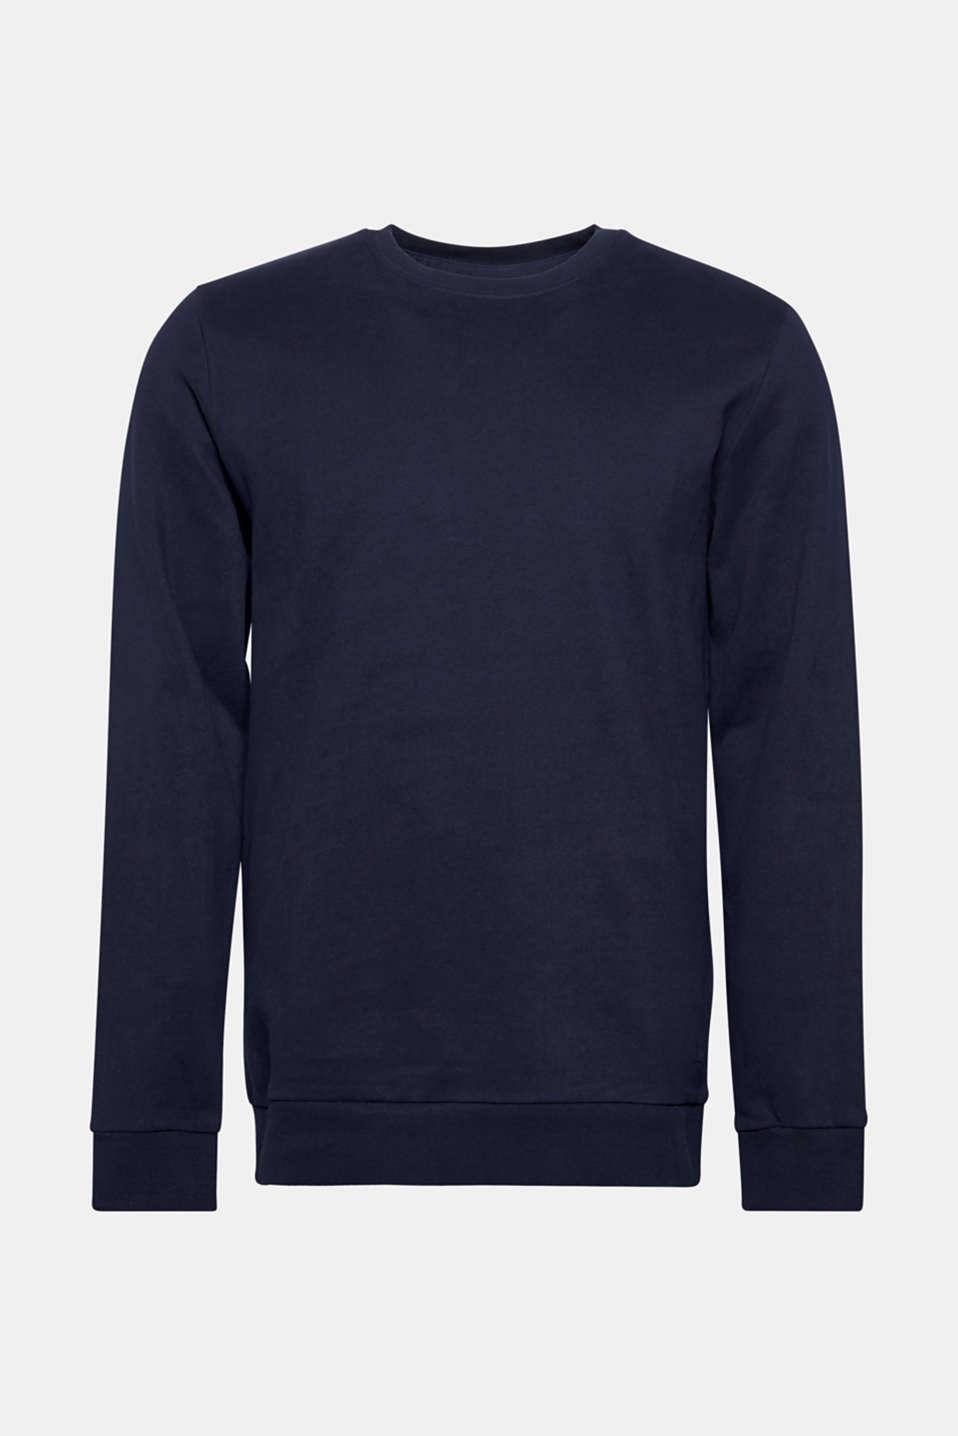 Sweatshirt in 100% cotton, NAVY, detail image number 7